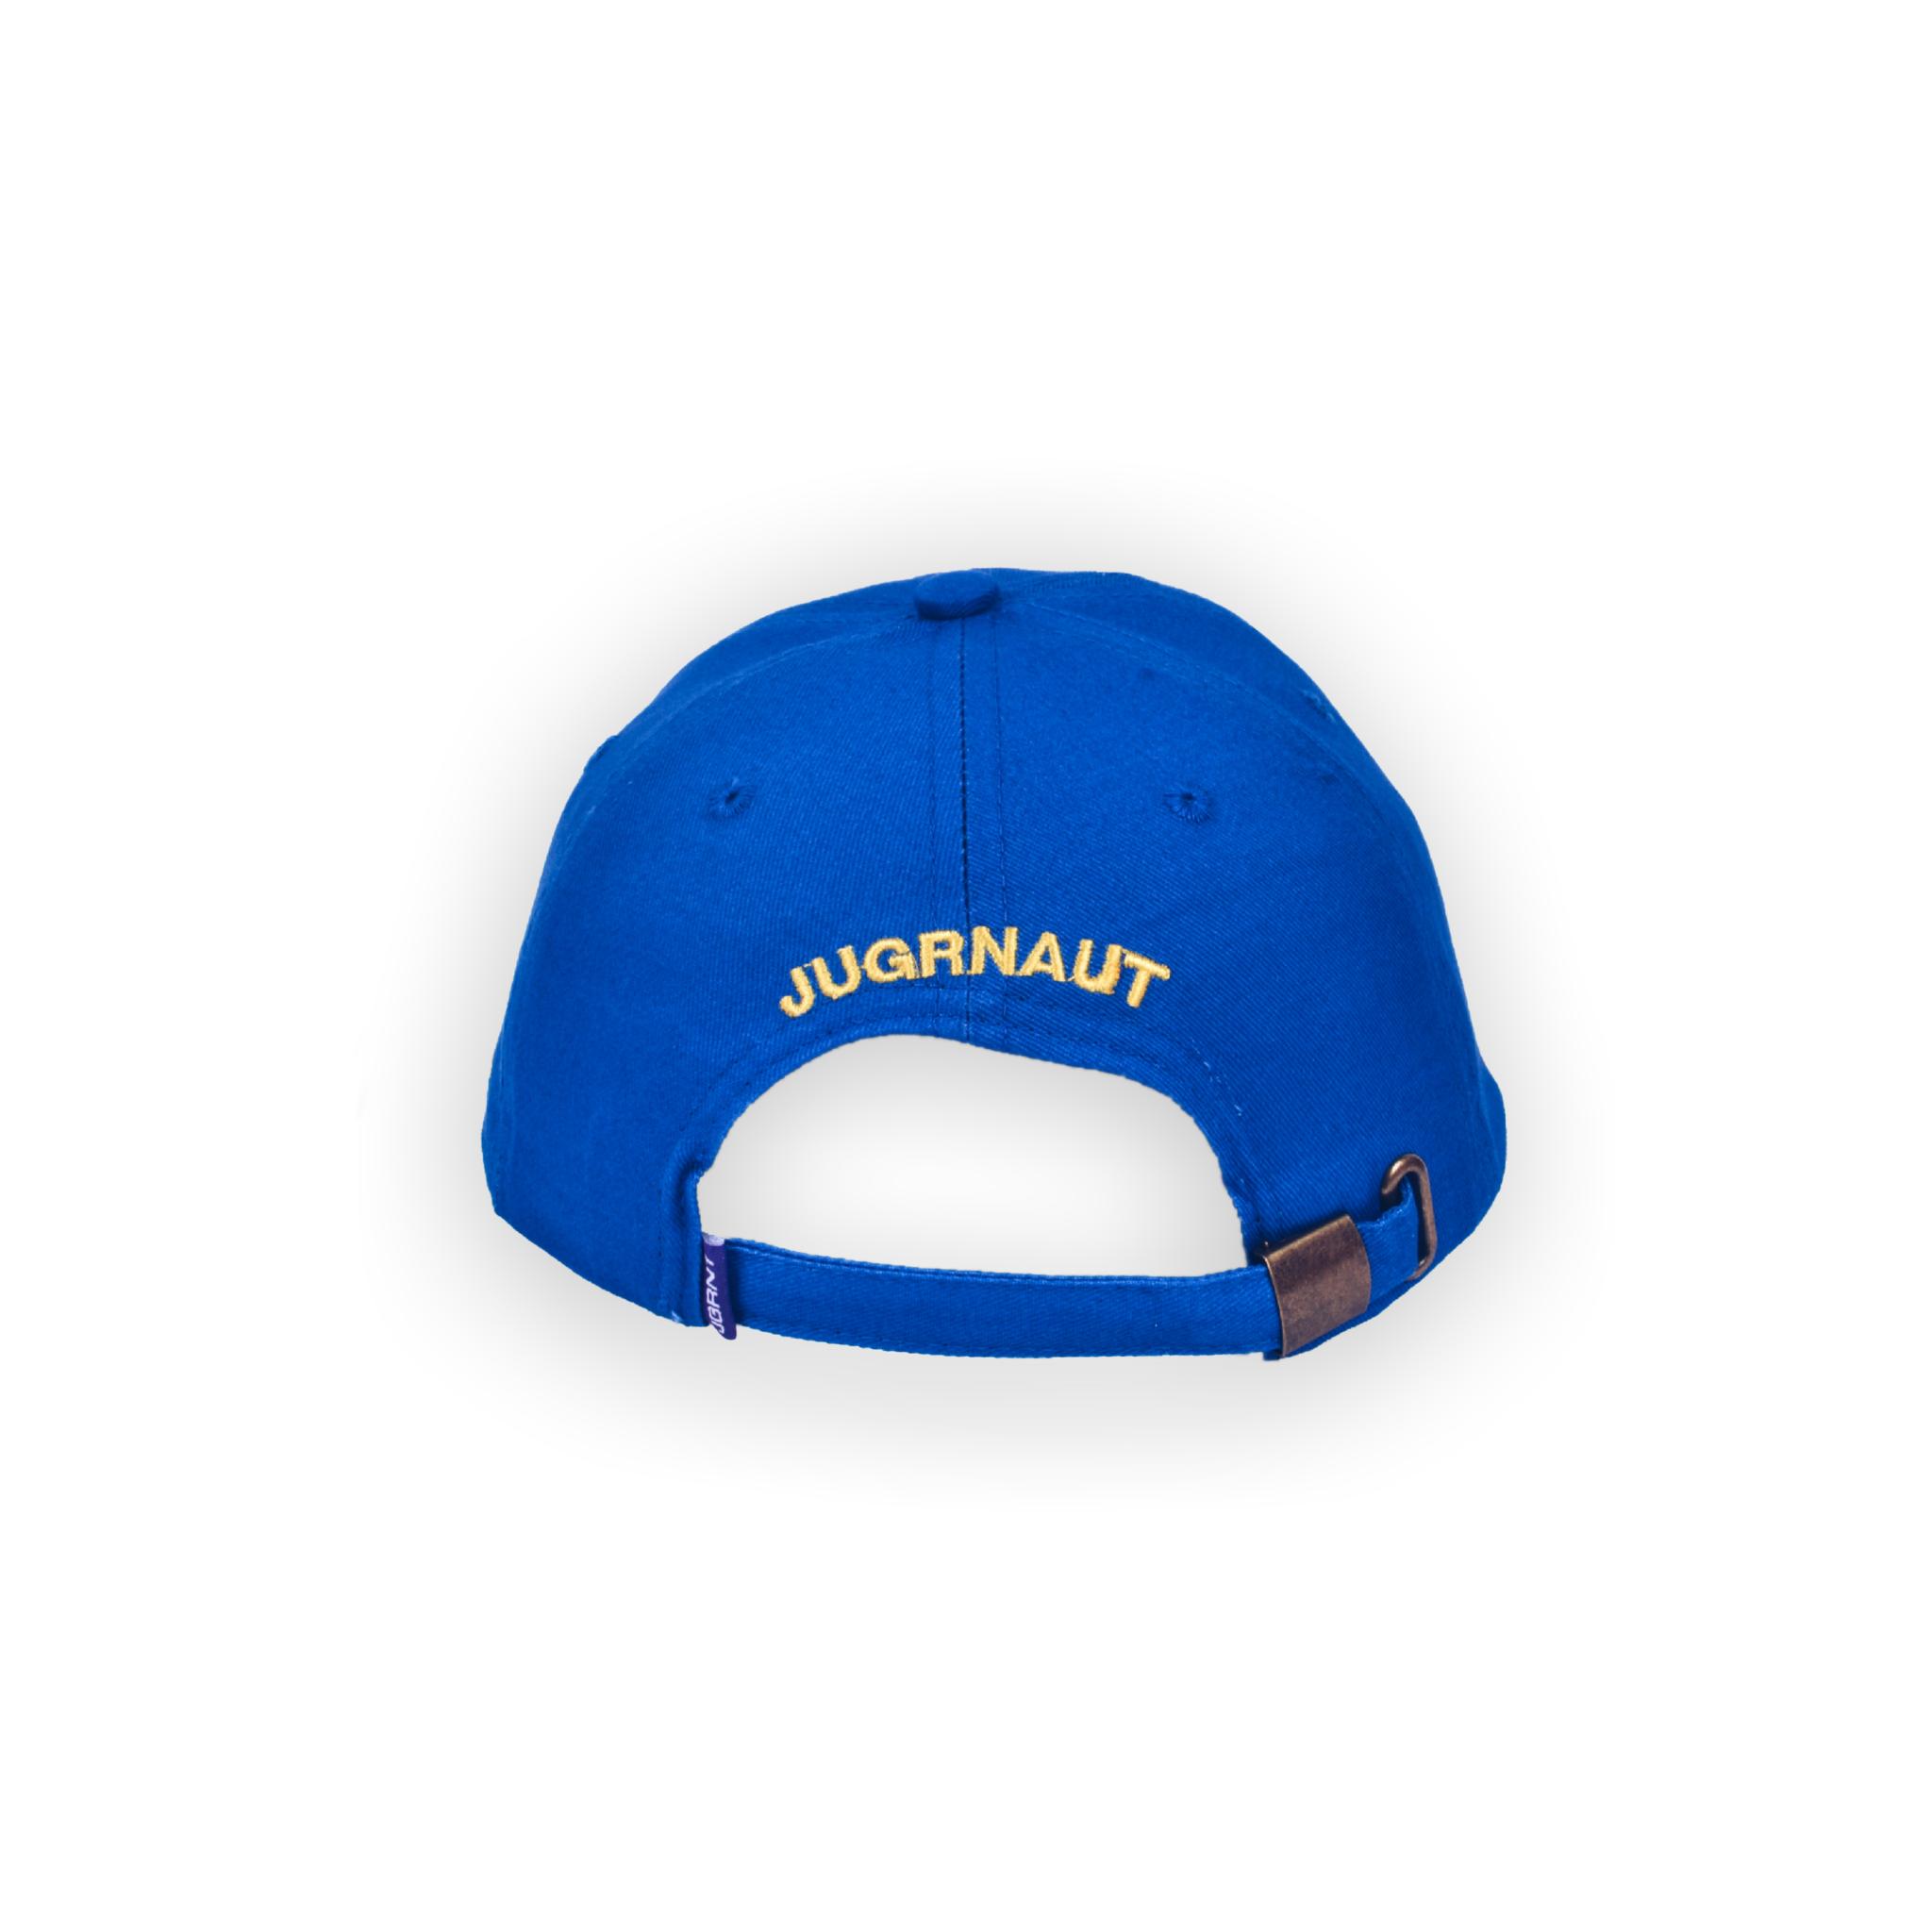 Jugrnaut Jugrnaut Camous Logo Felt Cap Blue